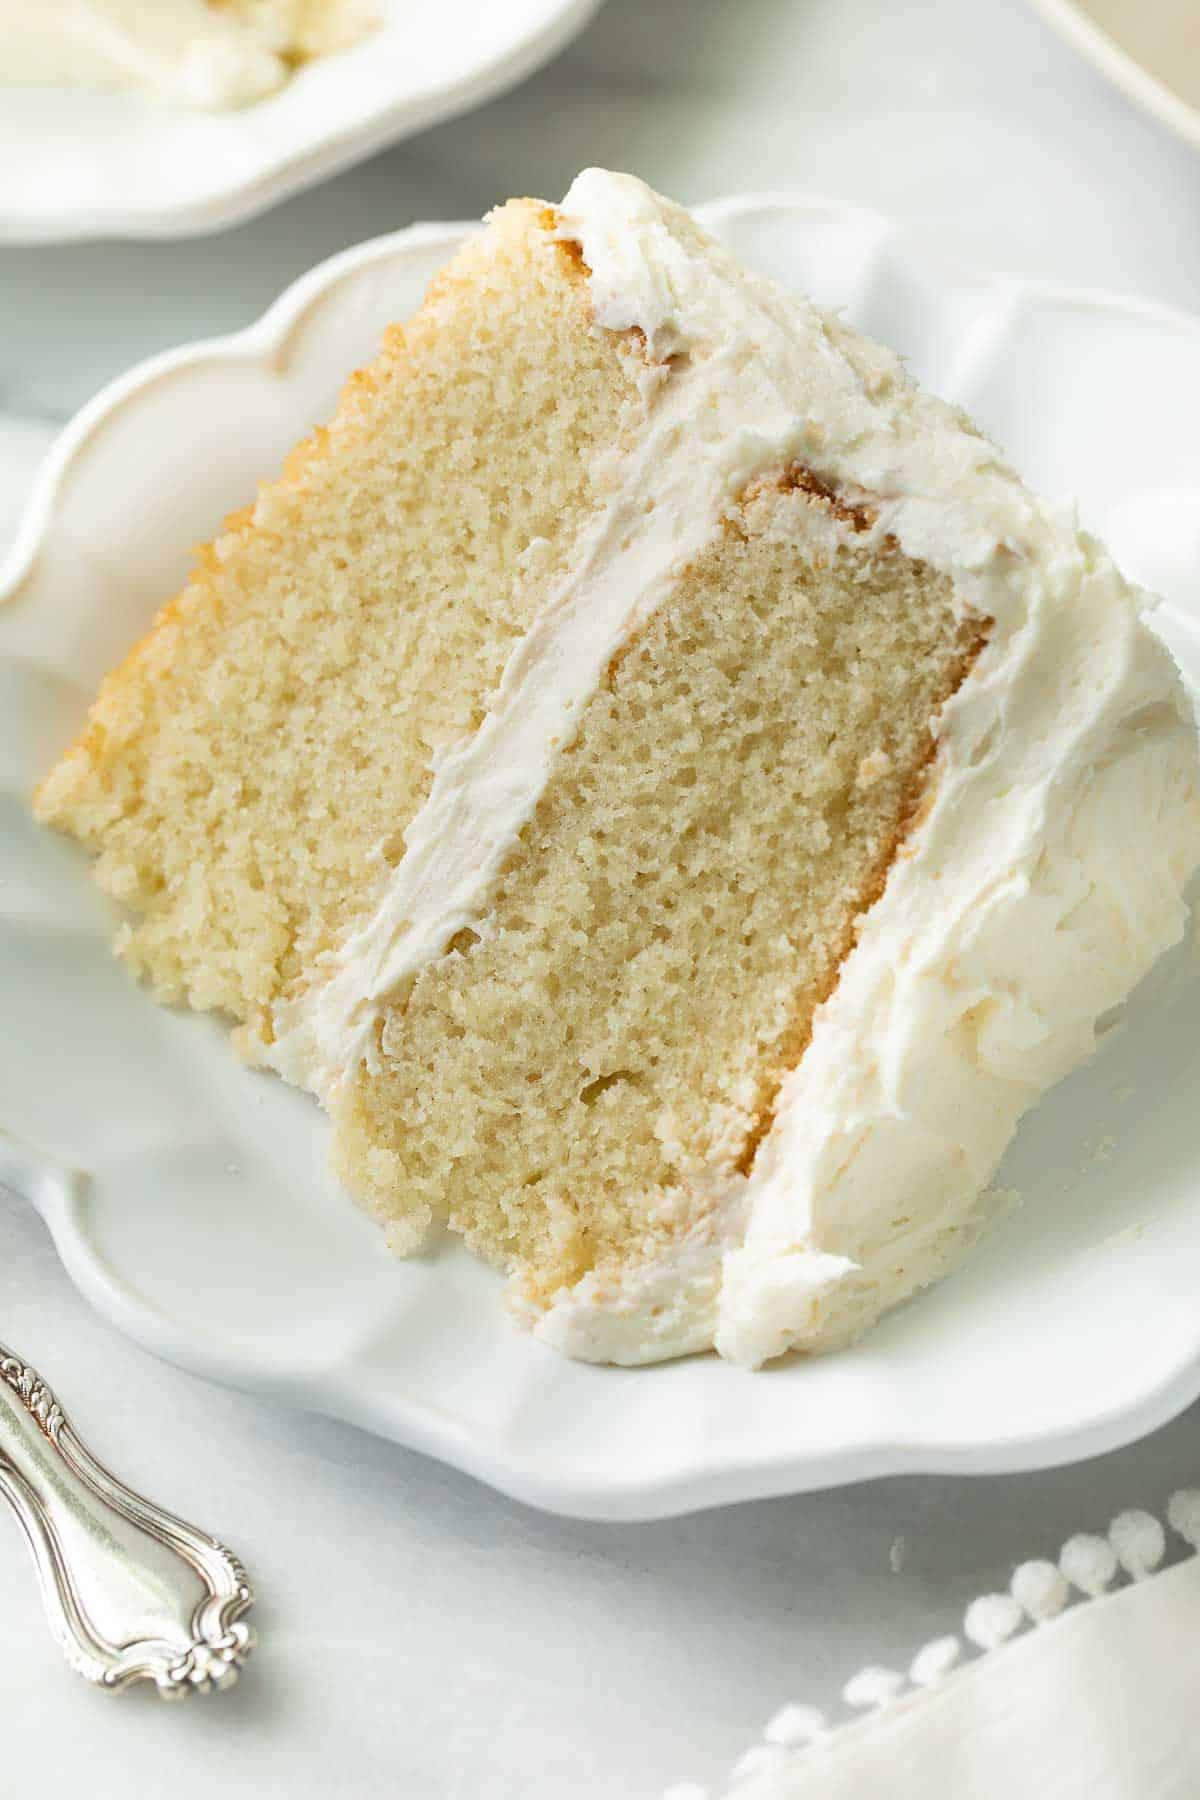 slice of gluten free vanilla cake on white plate